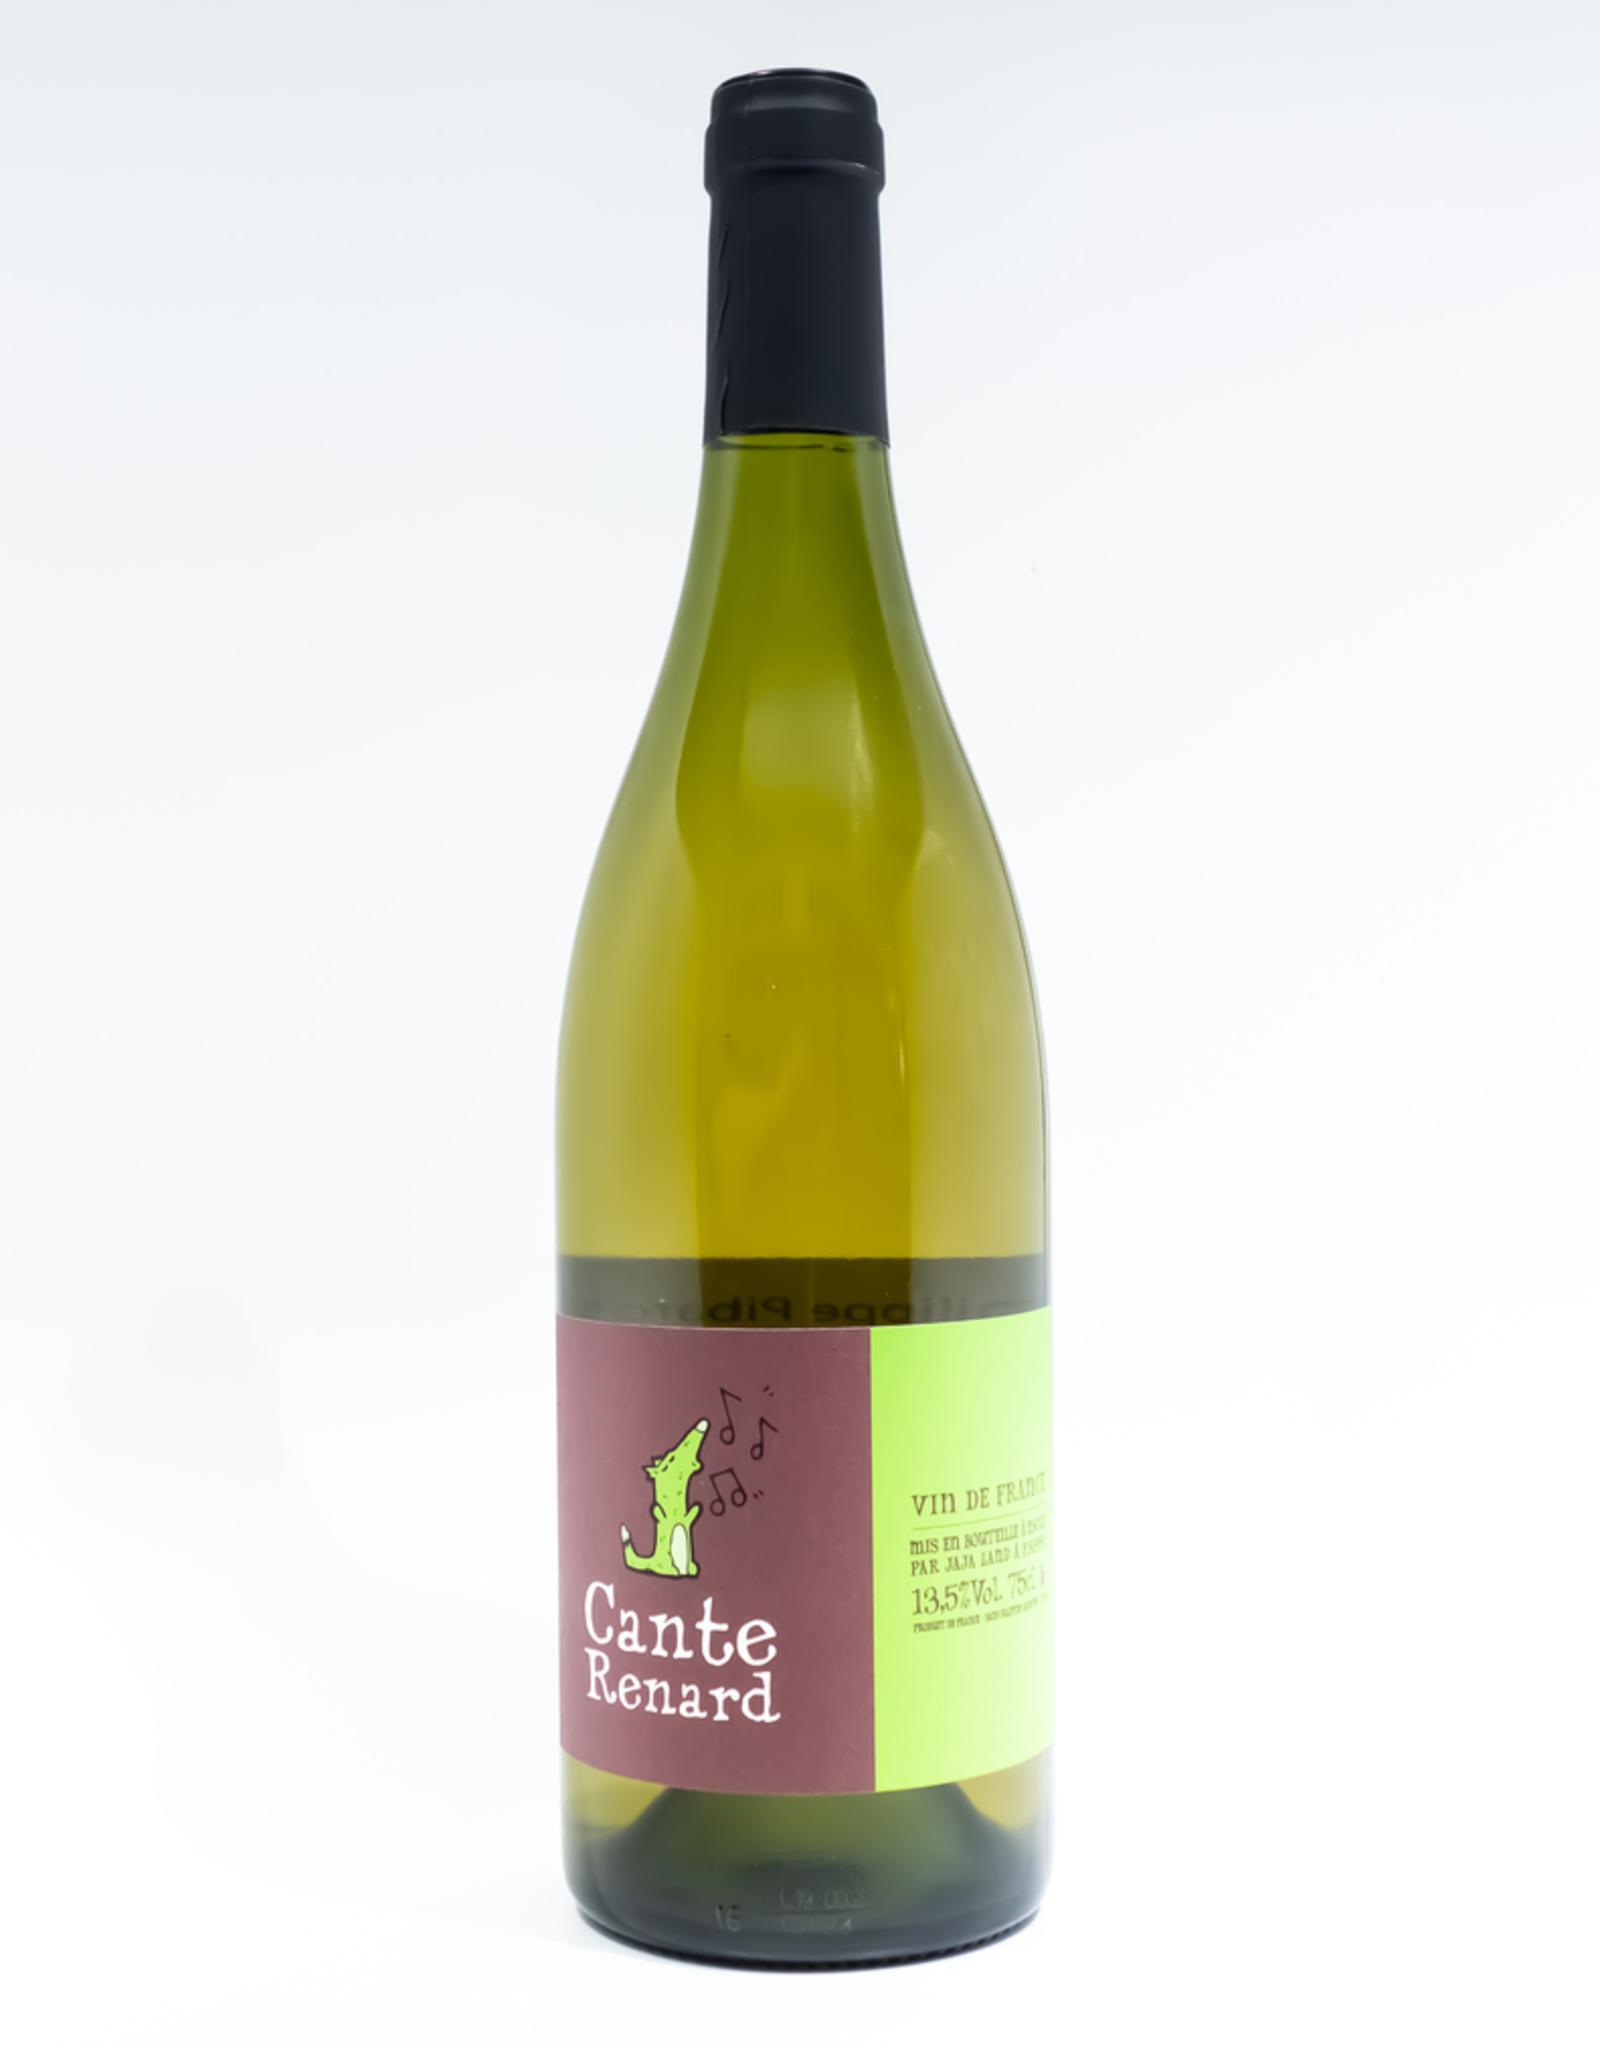 Wine-White-Round Philippe Pibarot 'Cante Renard' Blanc Pont du Gard IGP 2018